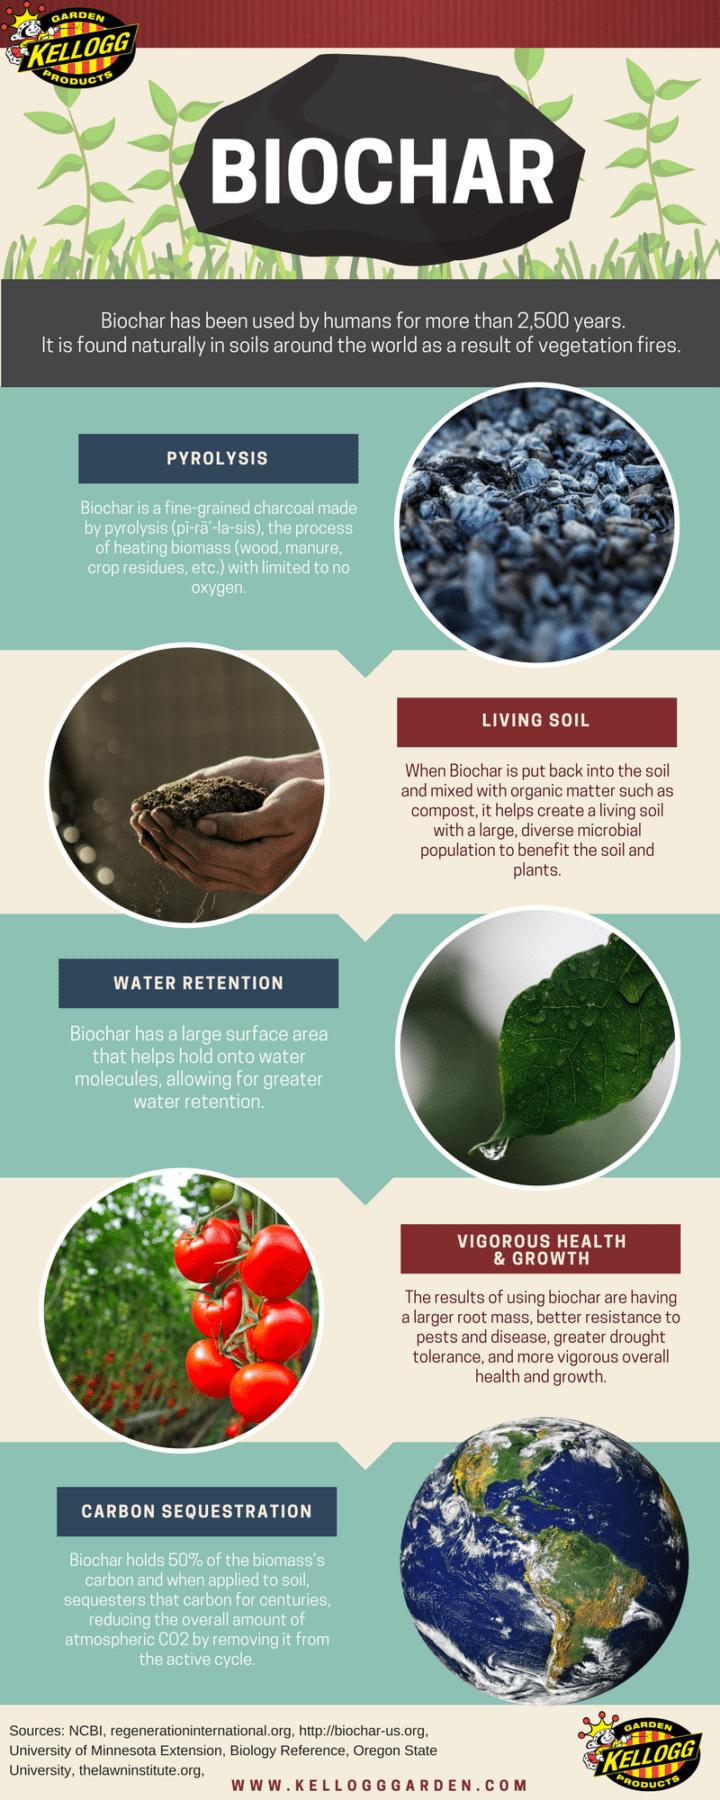 Benefits of Biochar